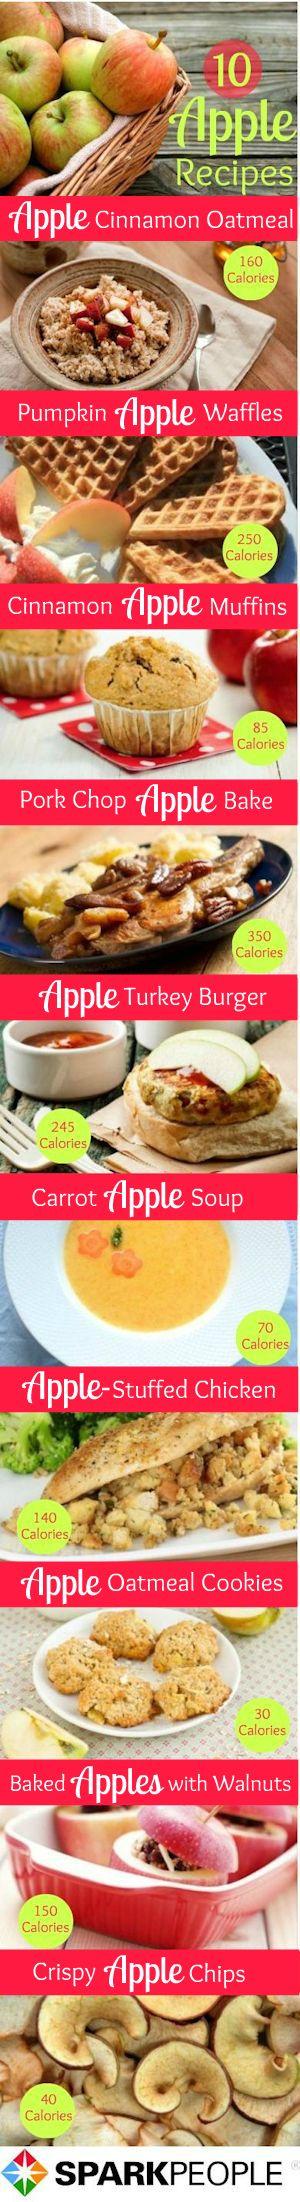 10 Ways to Enjoy Fall's Best Fruit: Apples!   via @SparkPeople #recipe #food #autumn